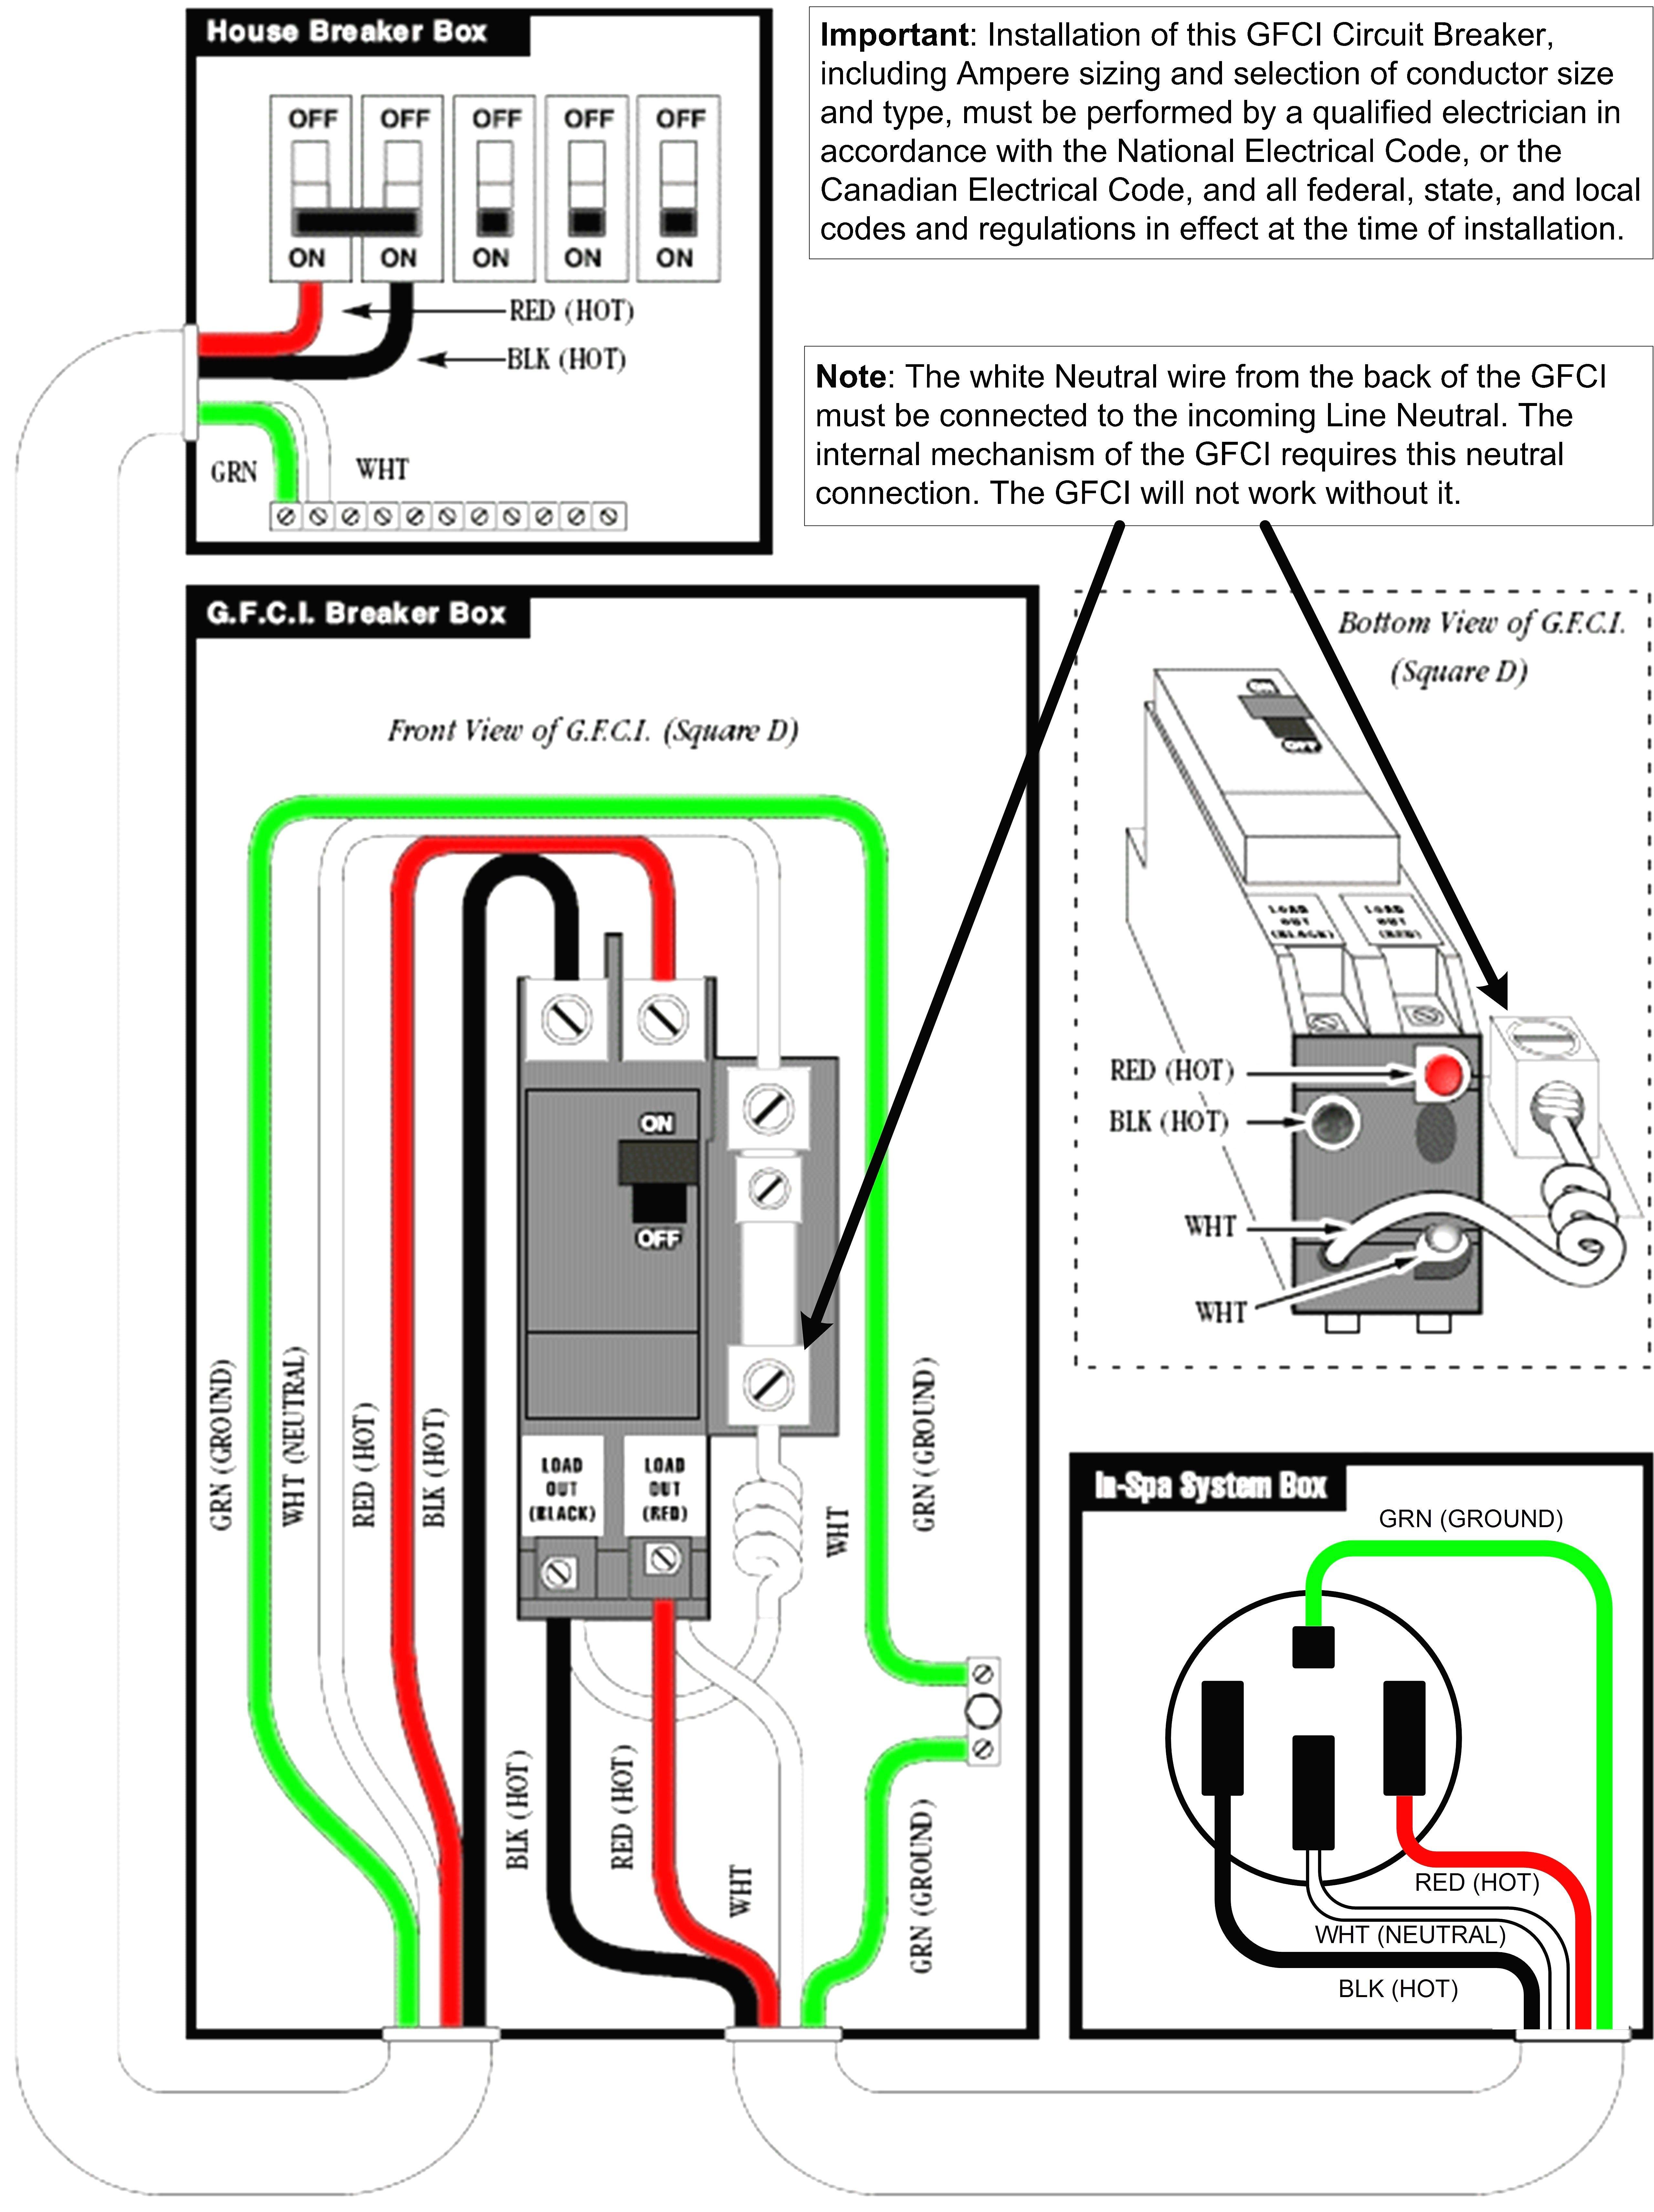 pin by bridget webster on diagram chart in 2019 light switch breaker box wiring diagram for [ 5119 x 6844 Pixel ]